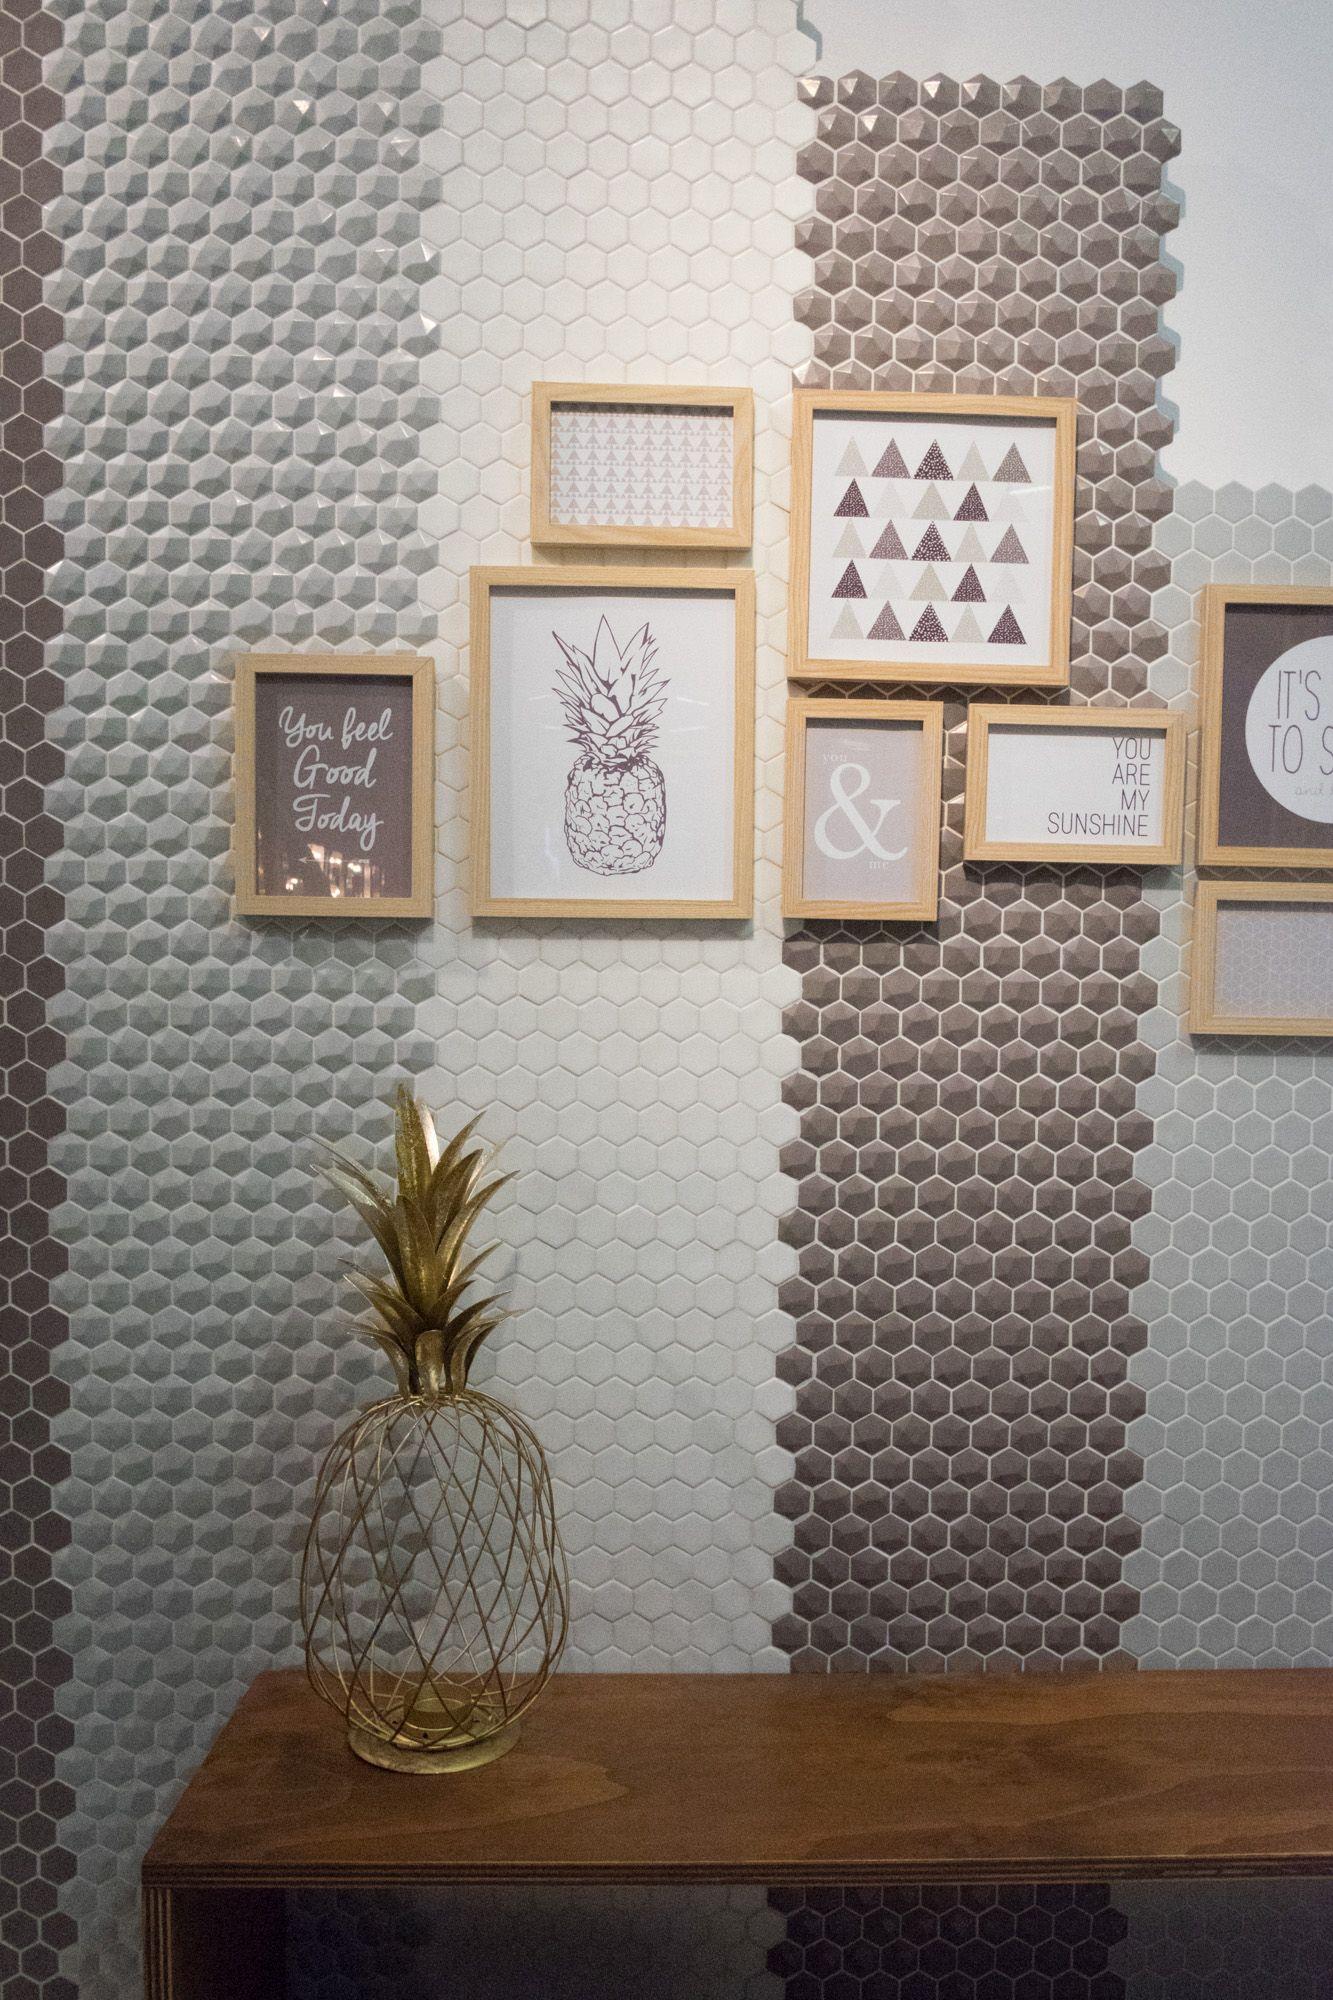 amazing ideas for dreamy bathroom tile designs